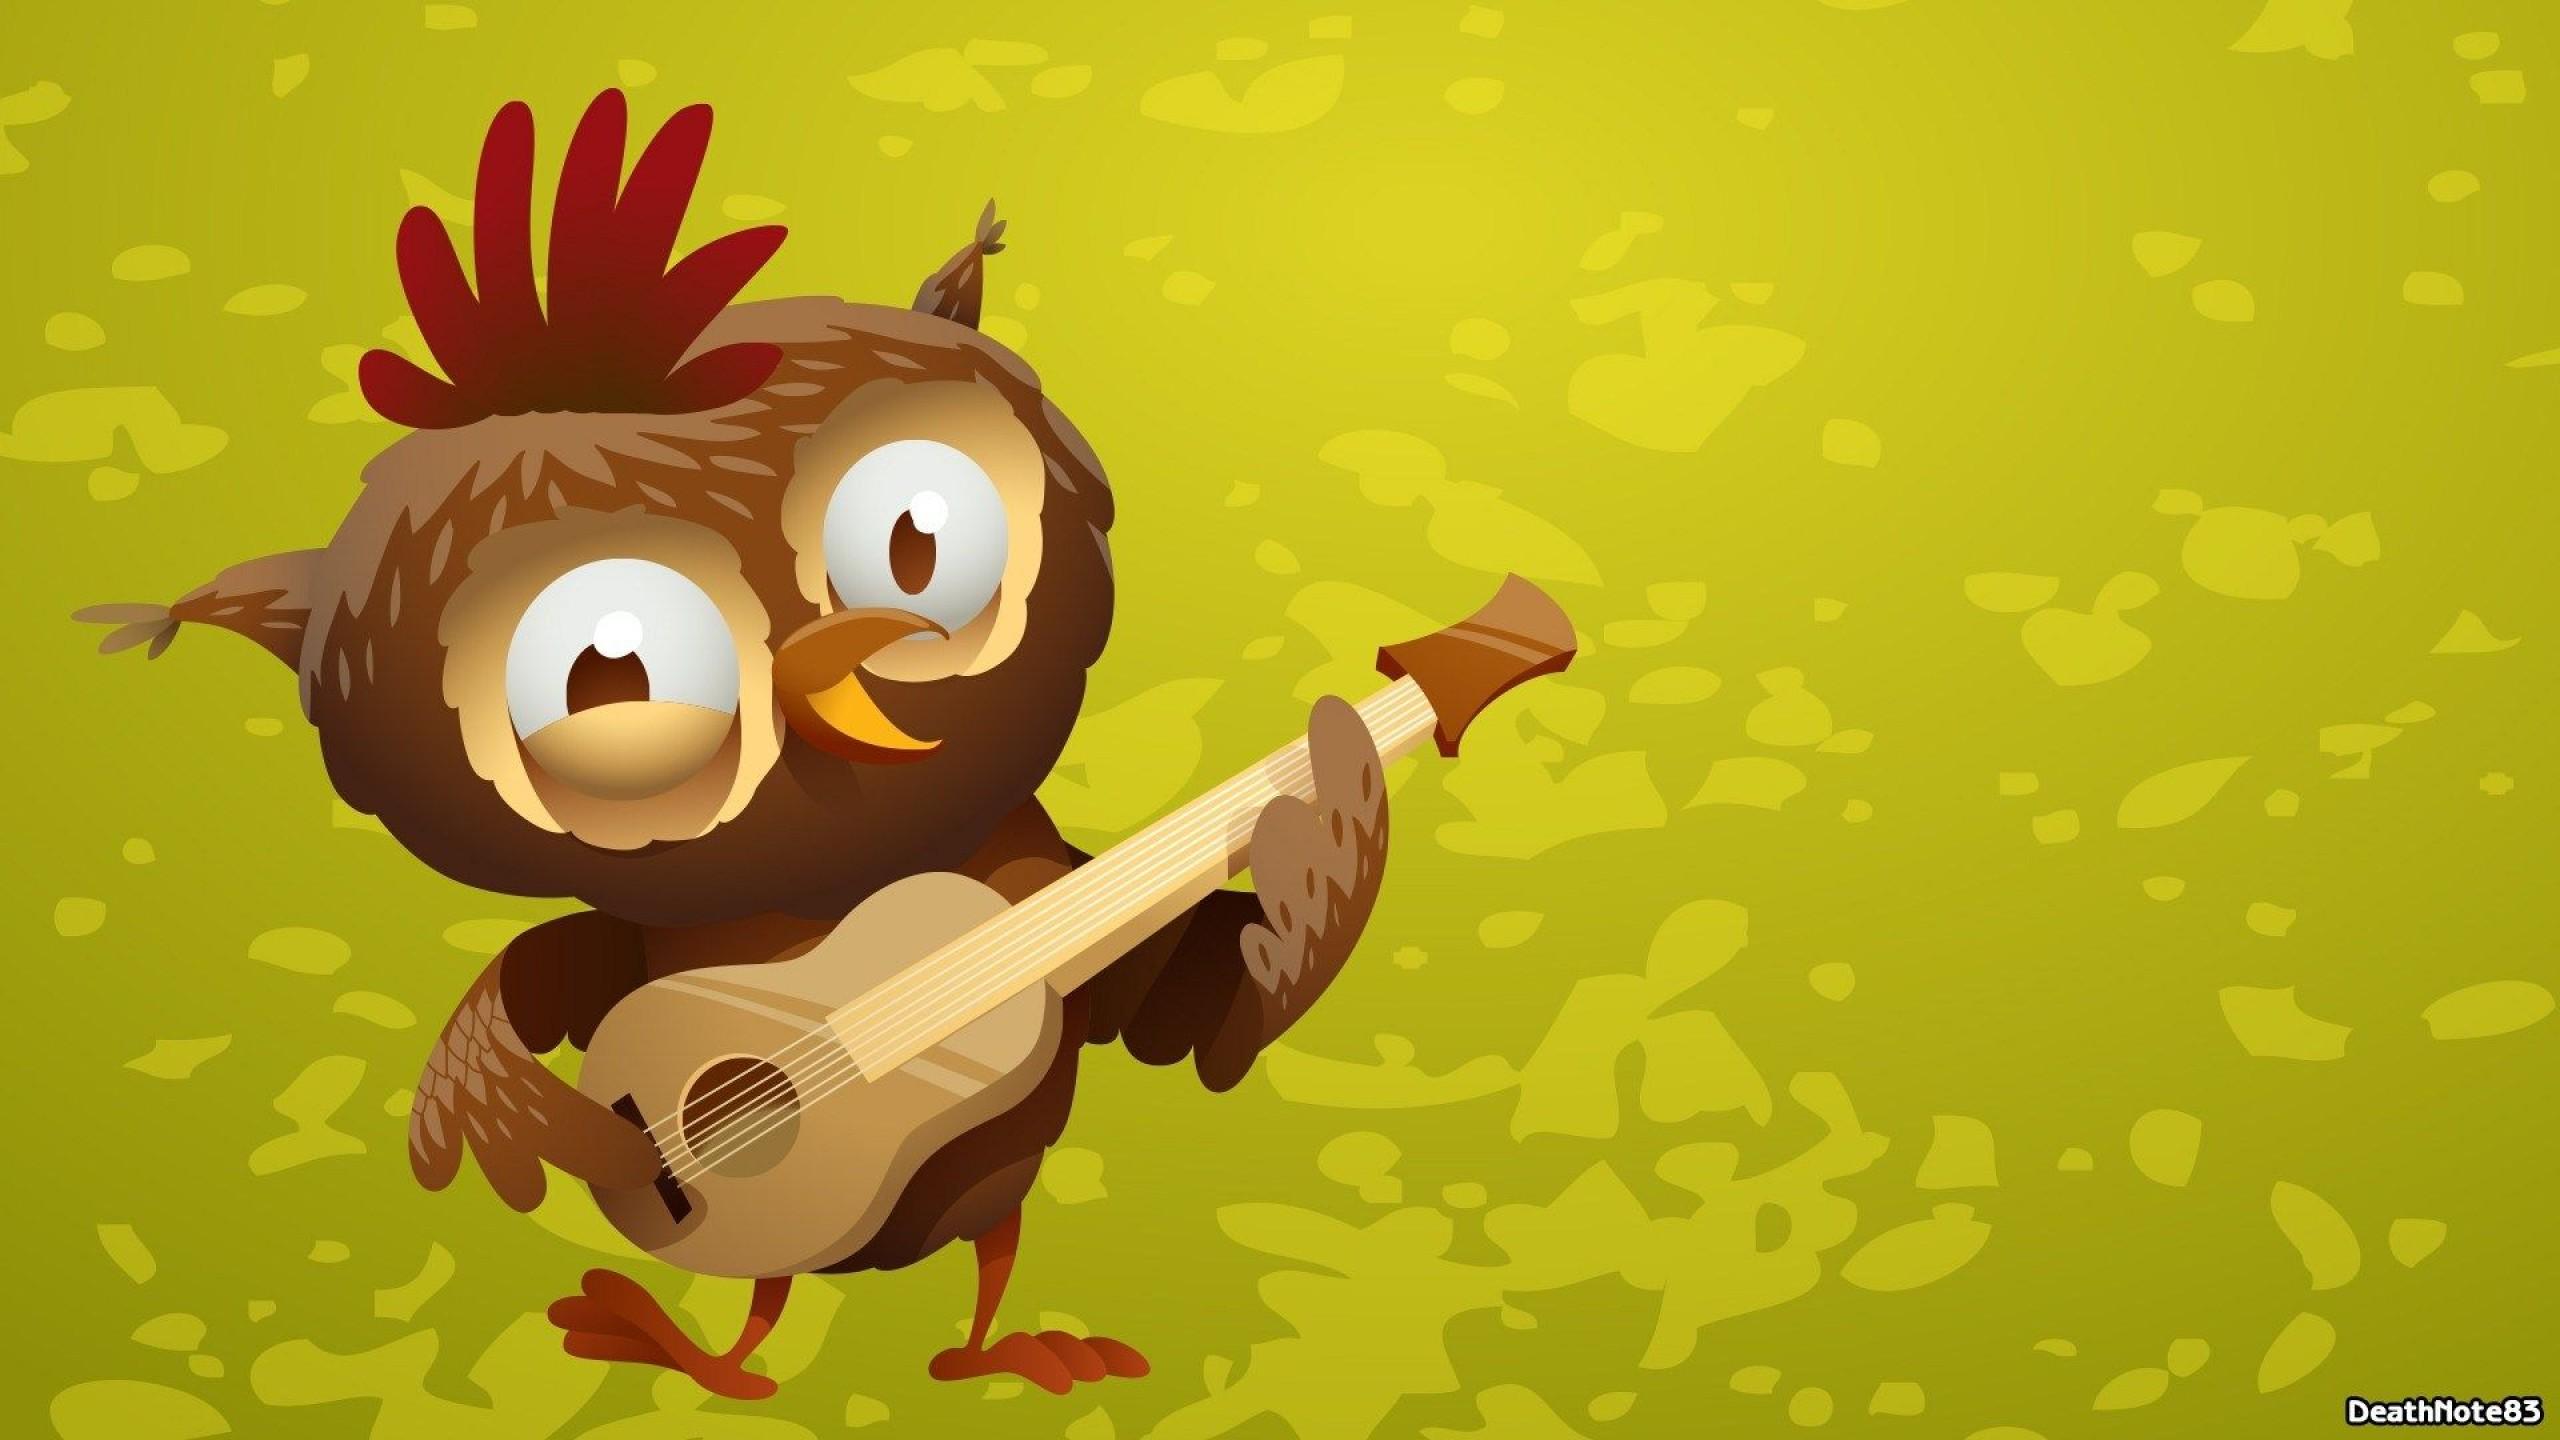 49+ Cartoon Owl Desktop Wallpaper on WallpaperSafari